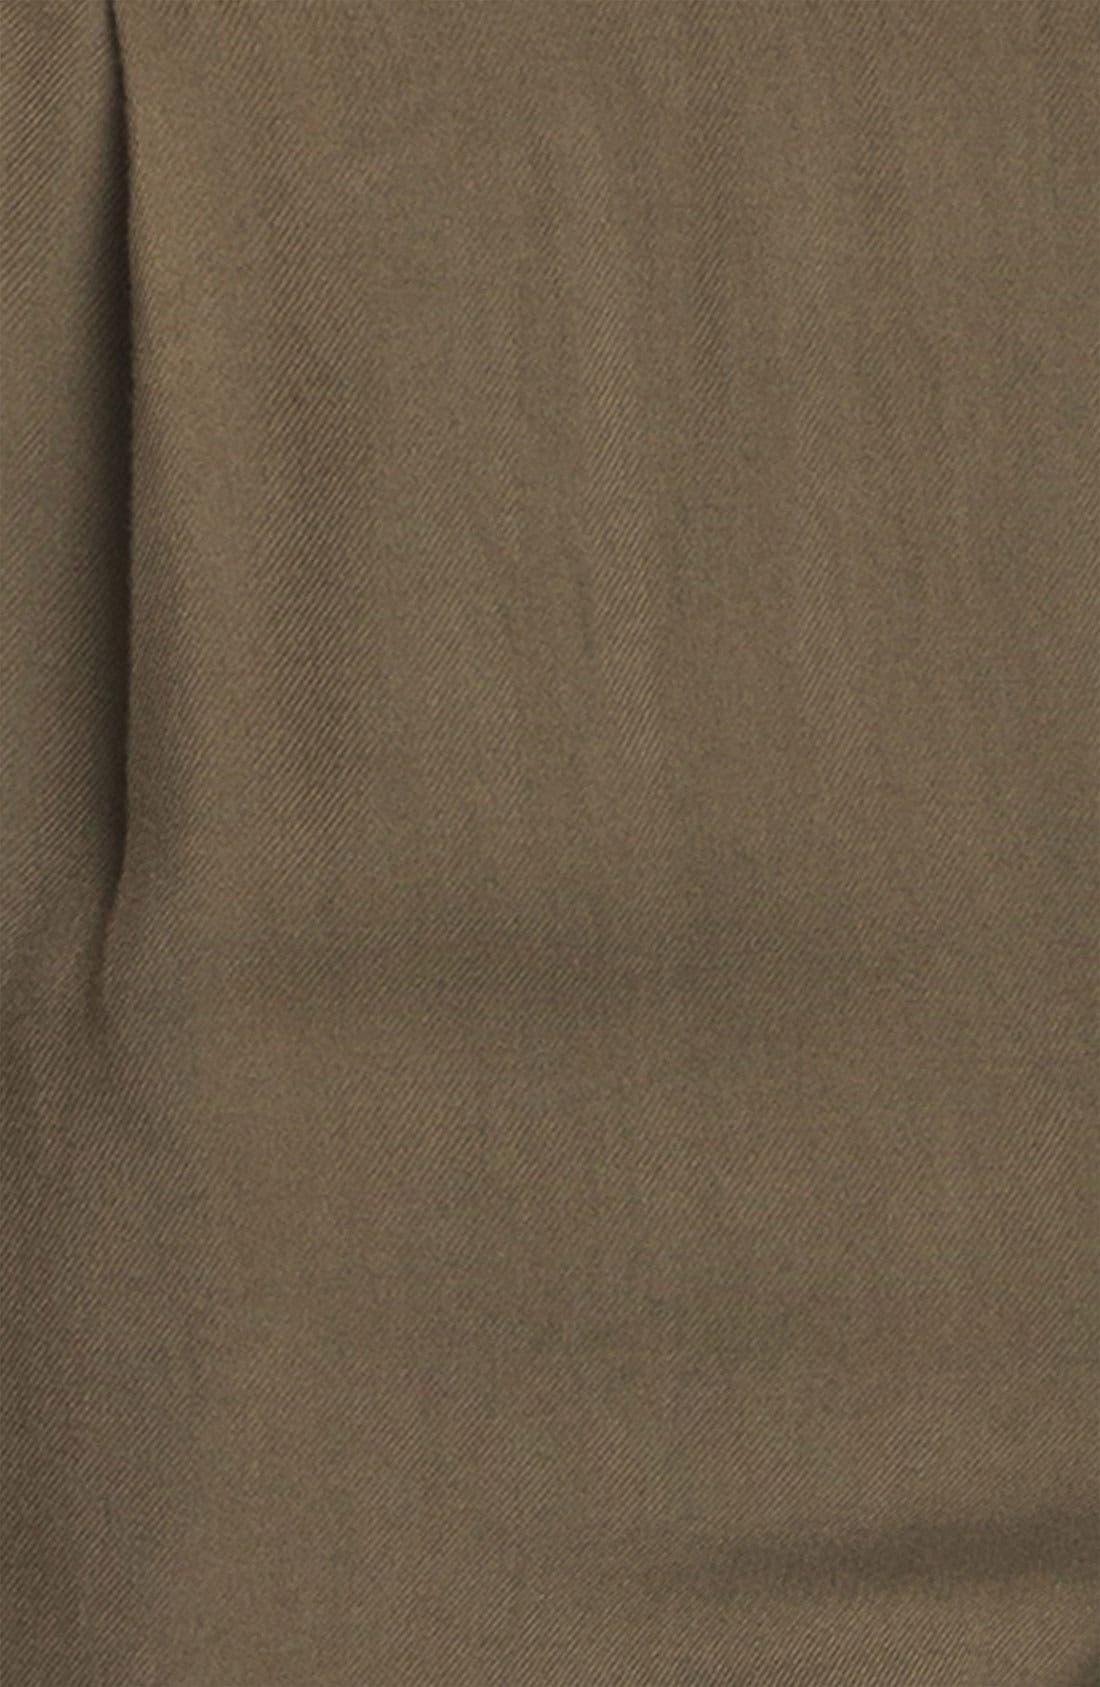 Alternate Image 3  - Ella Moss 'Aiselin' Tapered Crop Pants